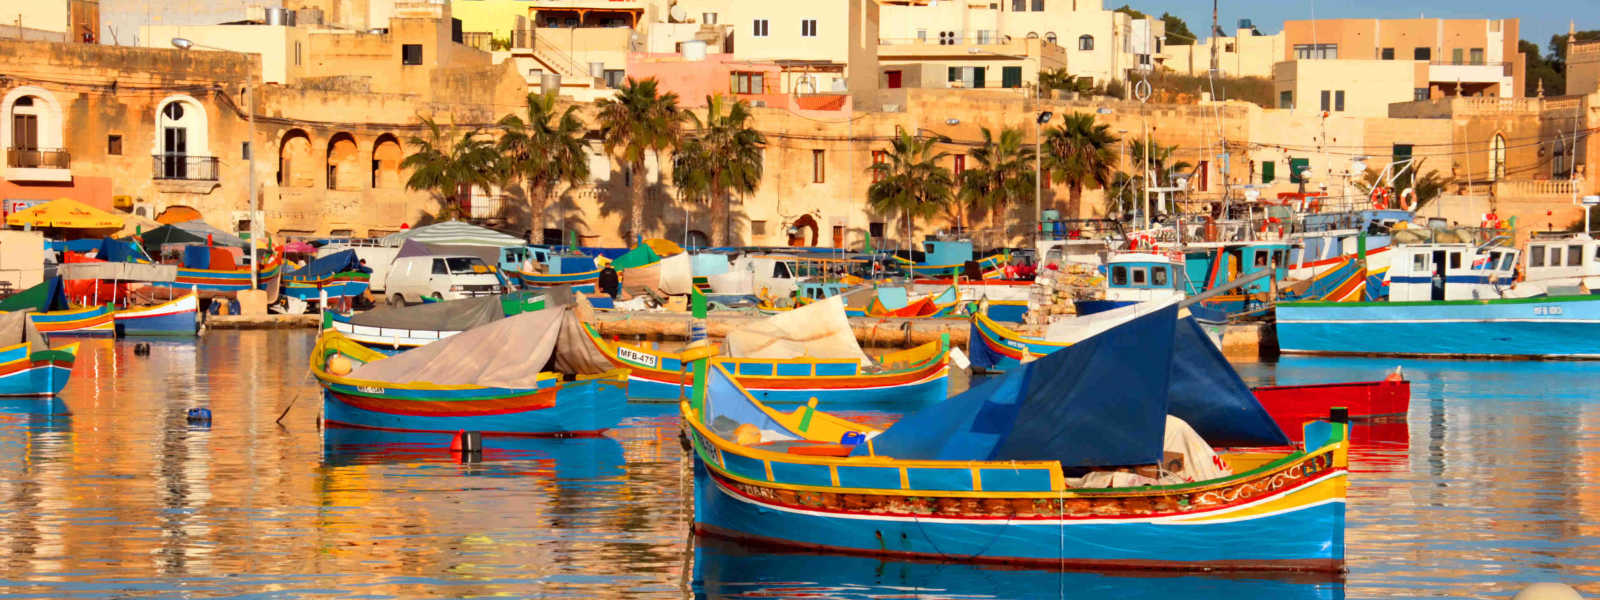 Мальта, лодочки